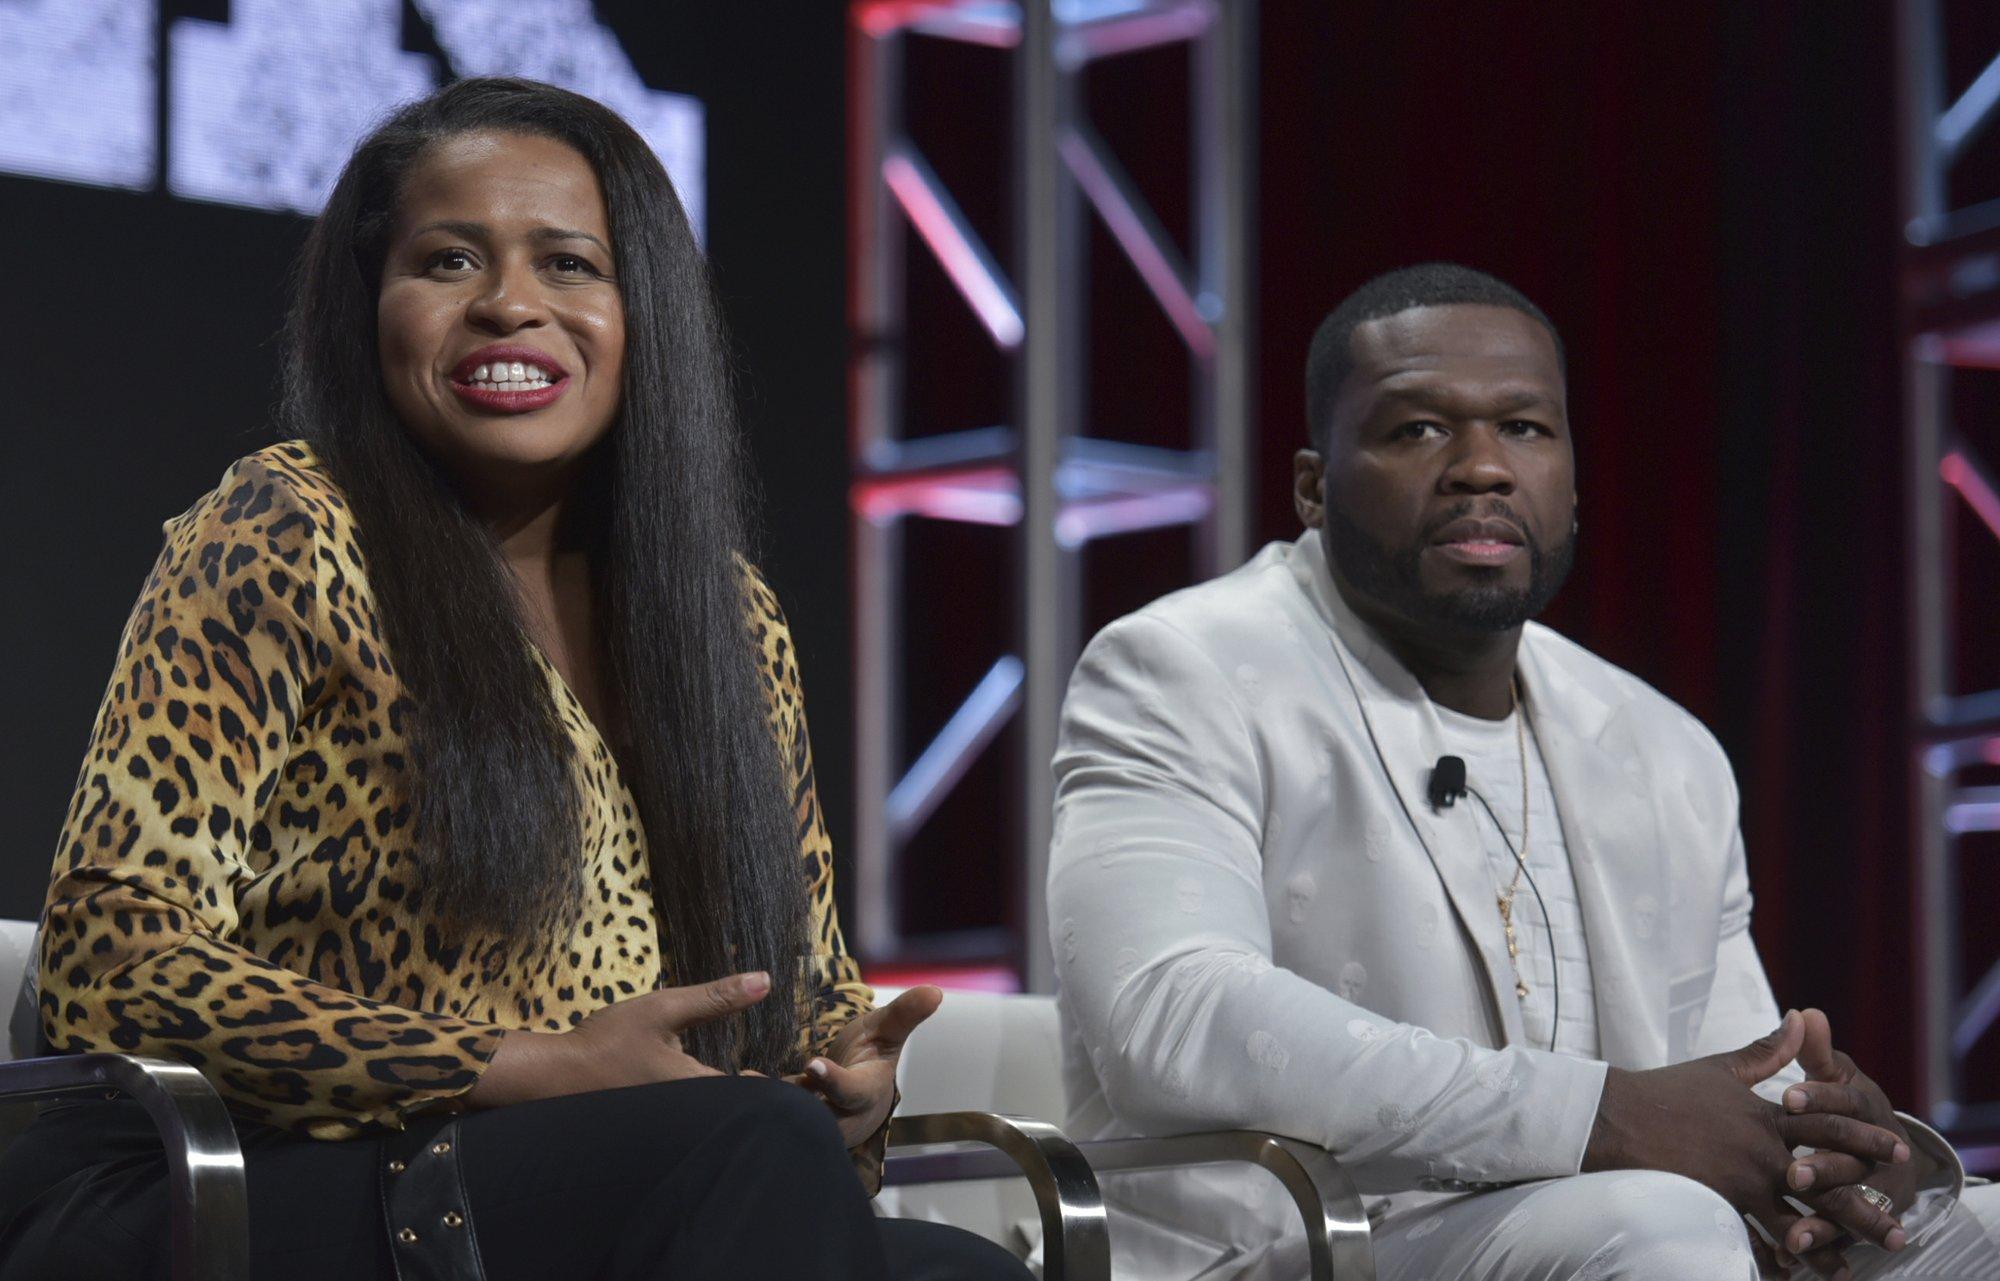 A beaming 50 Cent, tough questions part of TV critics event